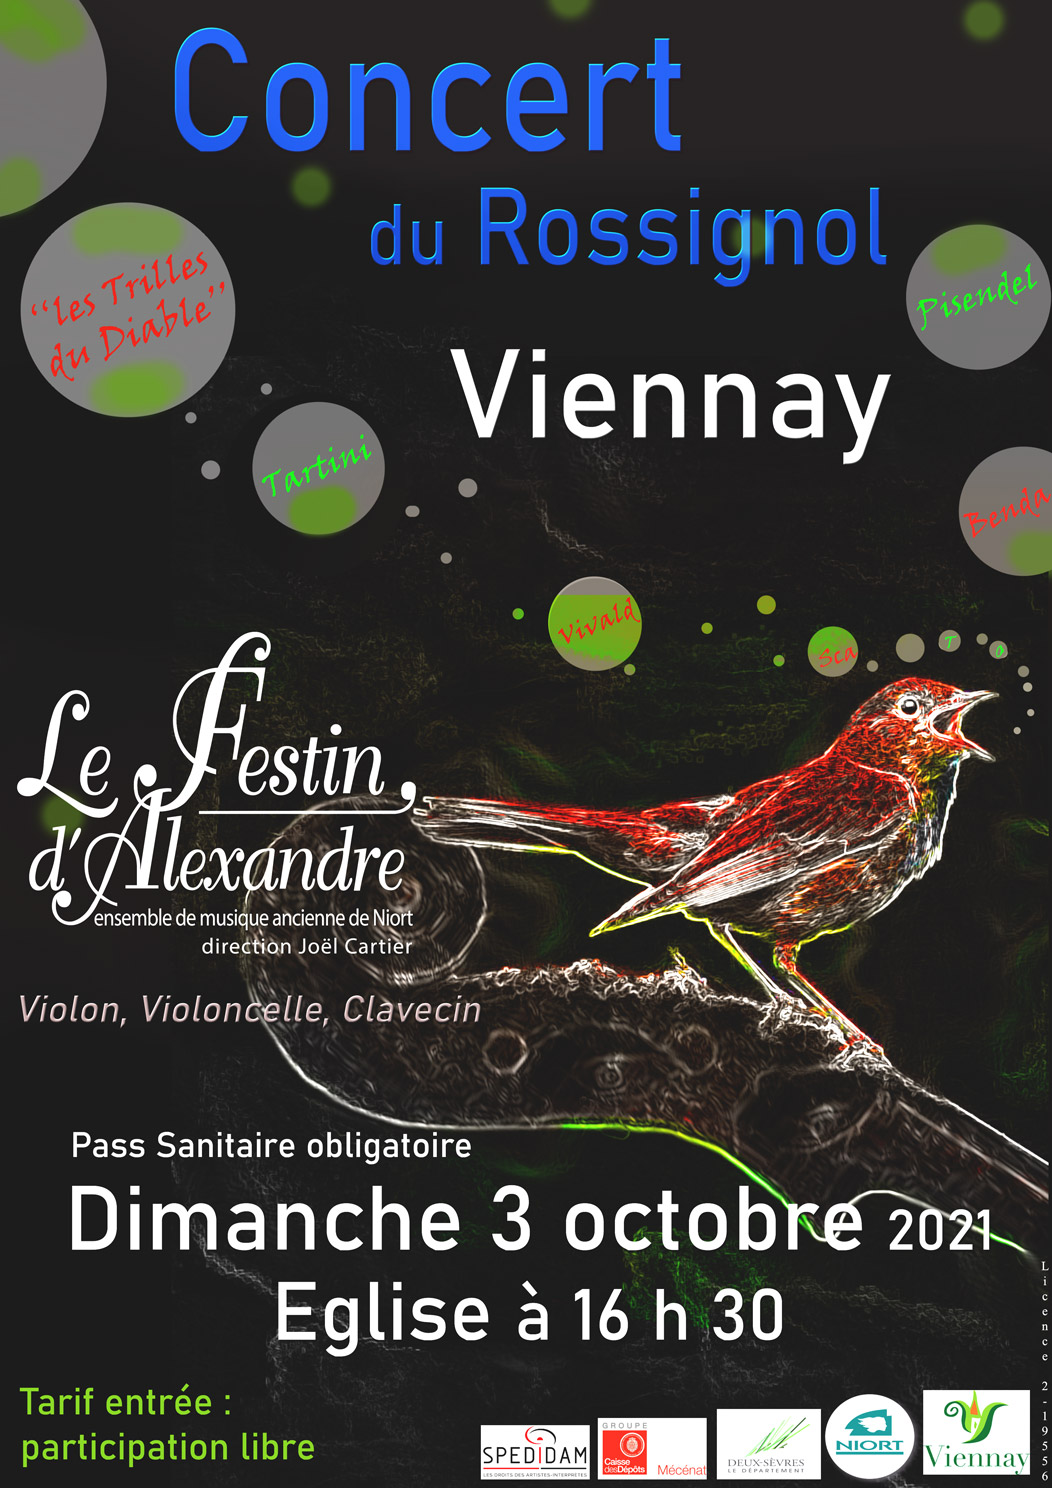 Concert du Rossignol